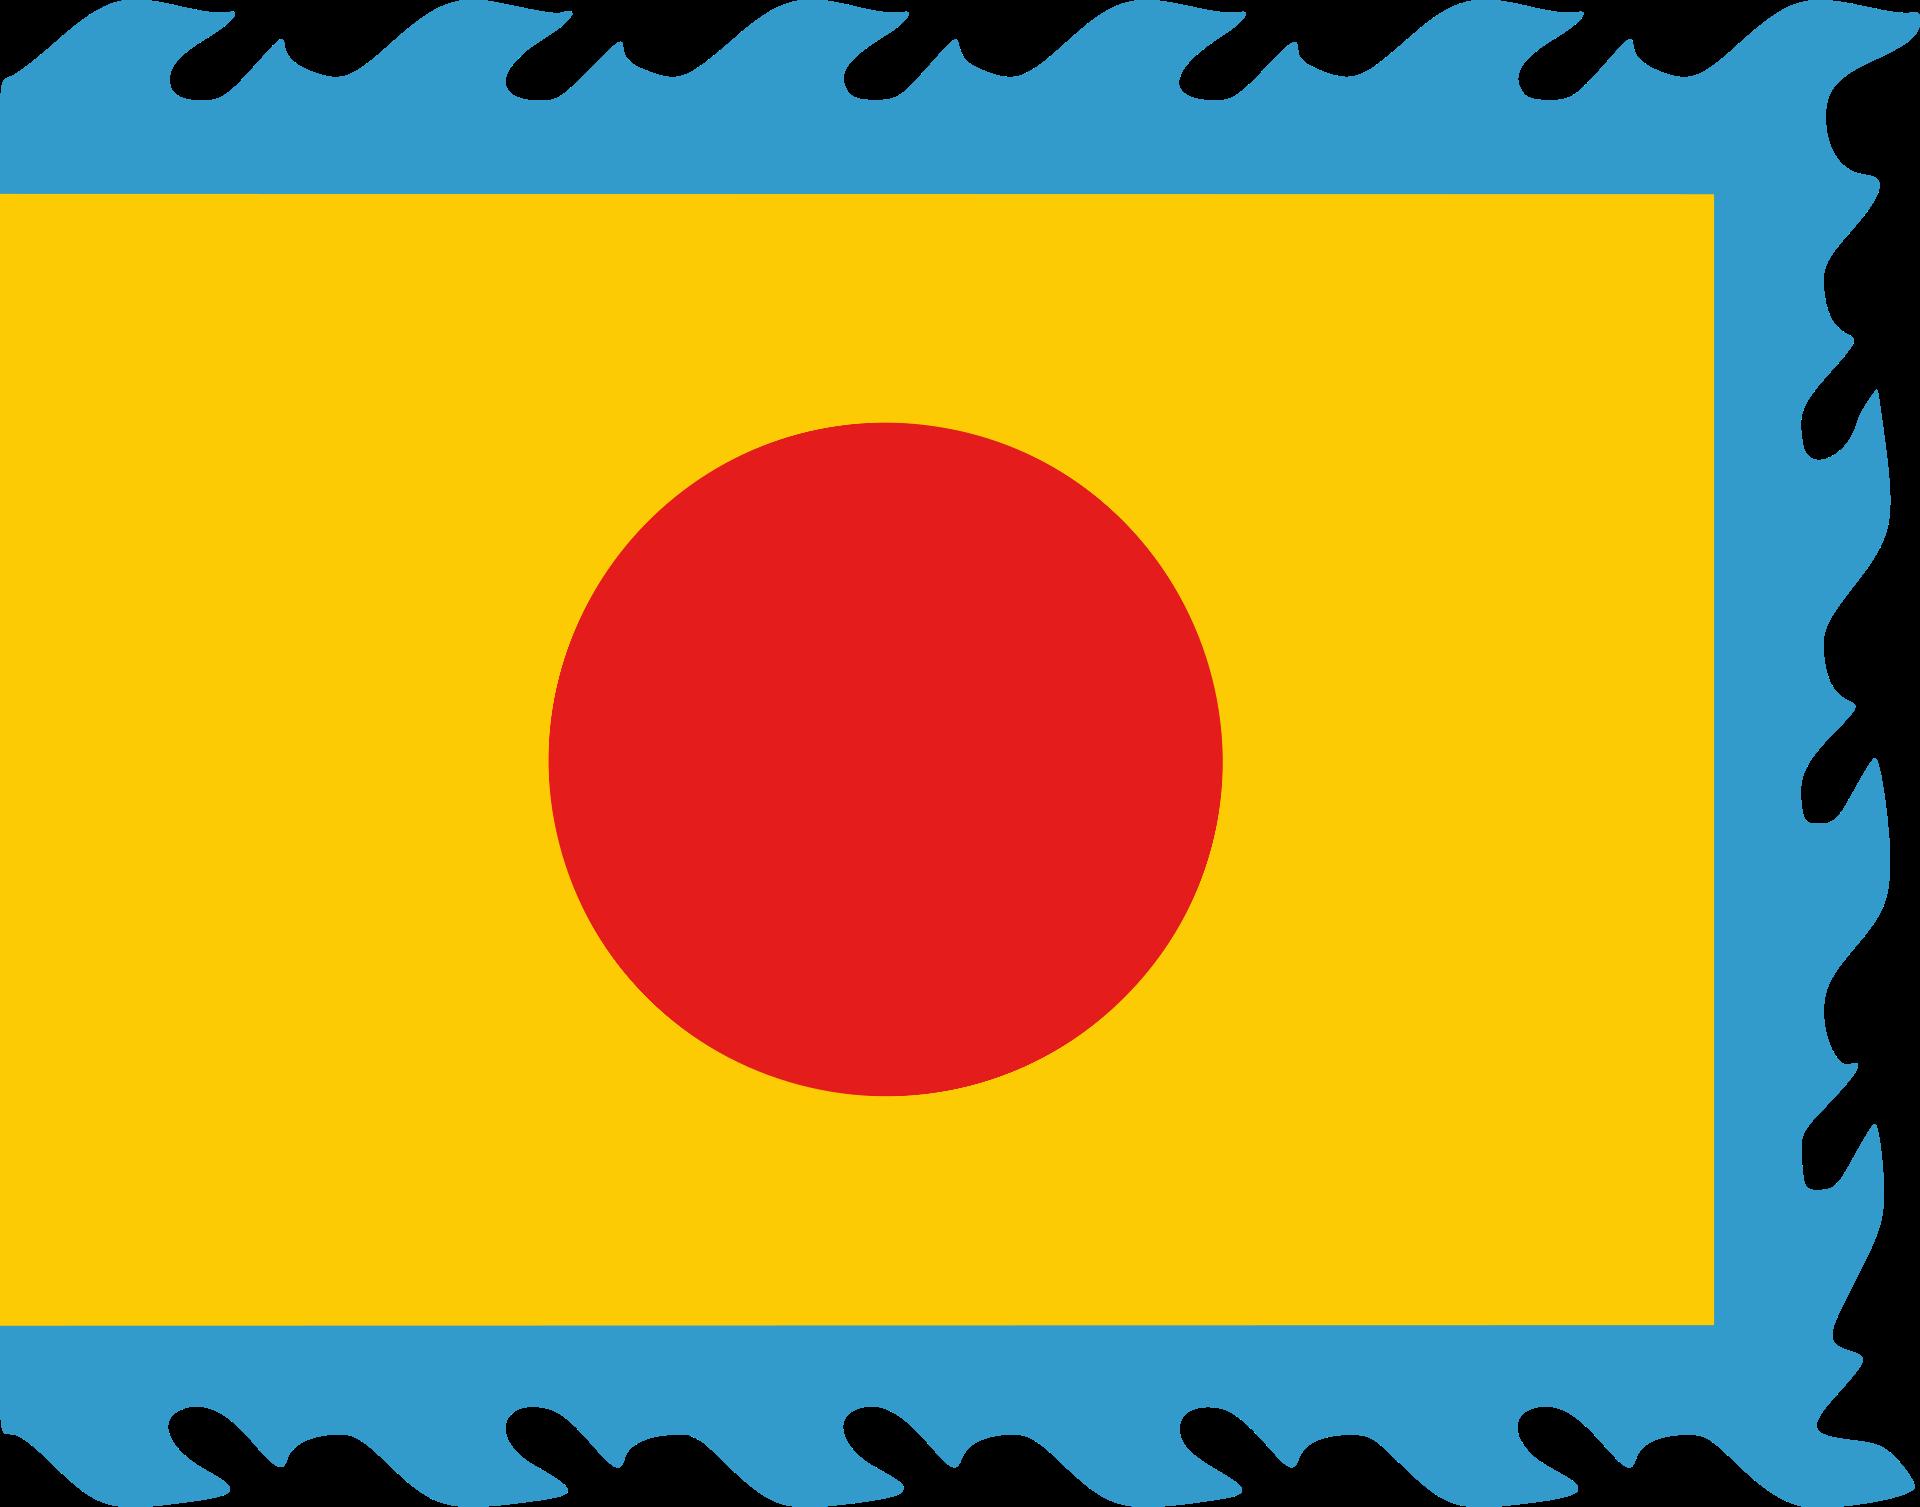 Flag of the Nguyen Dynasty Vietnam.